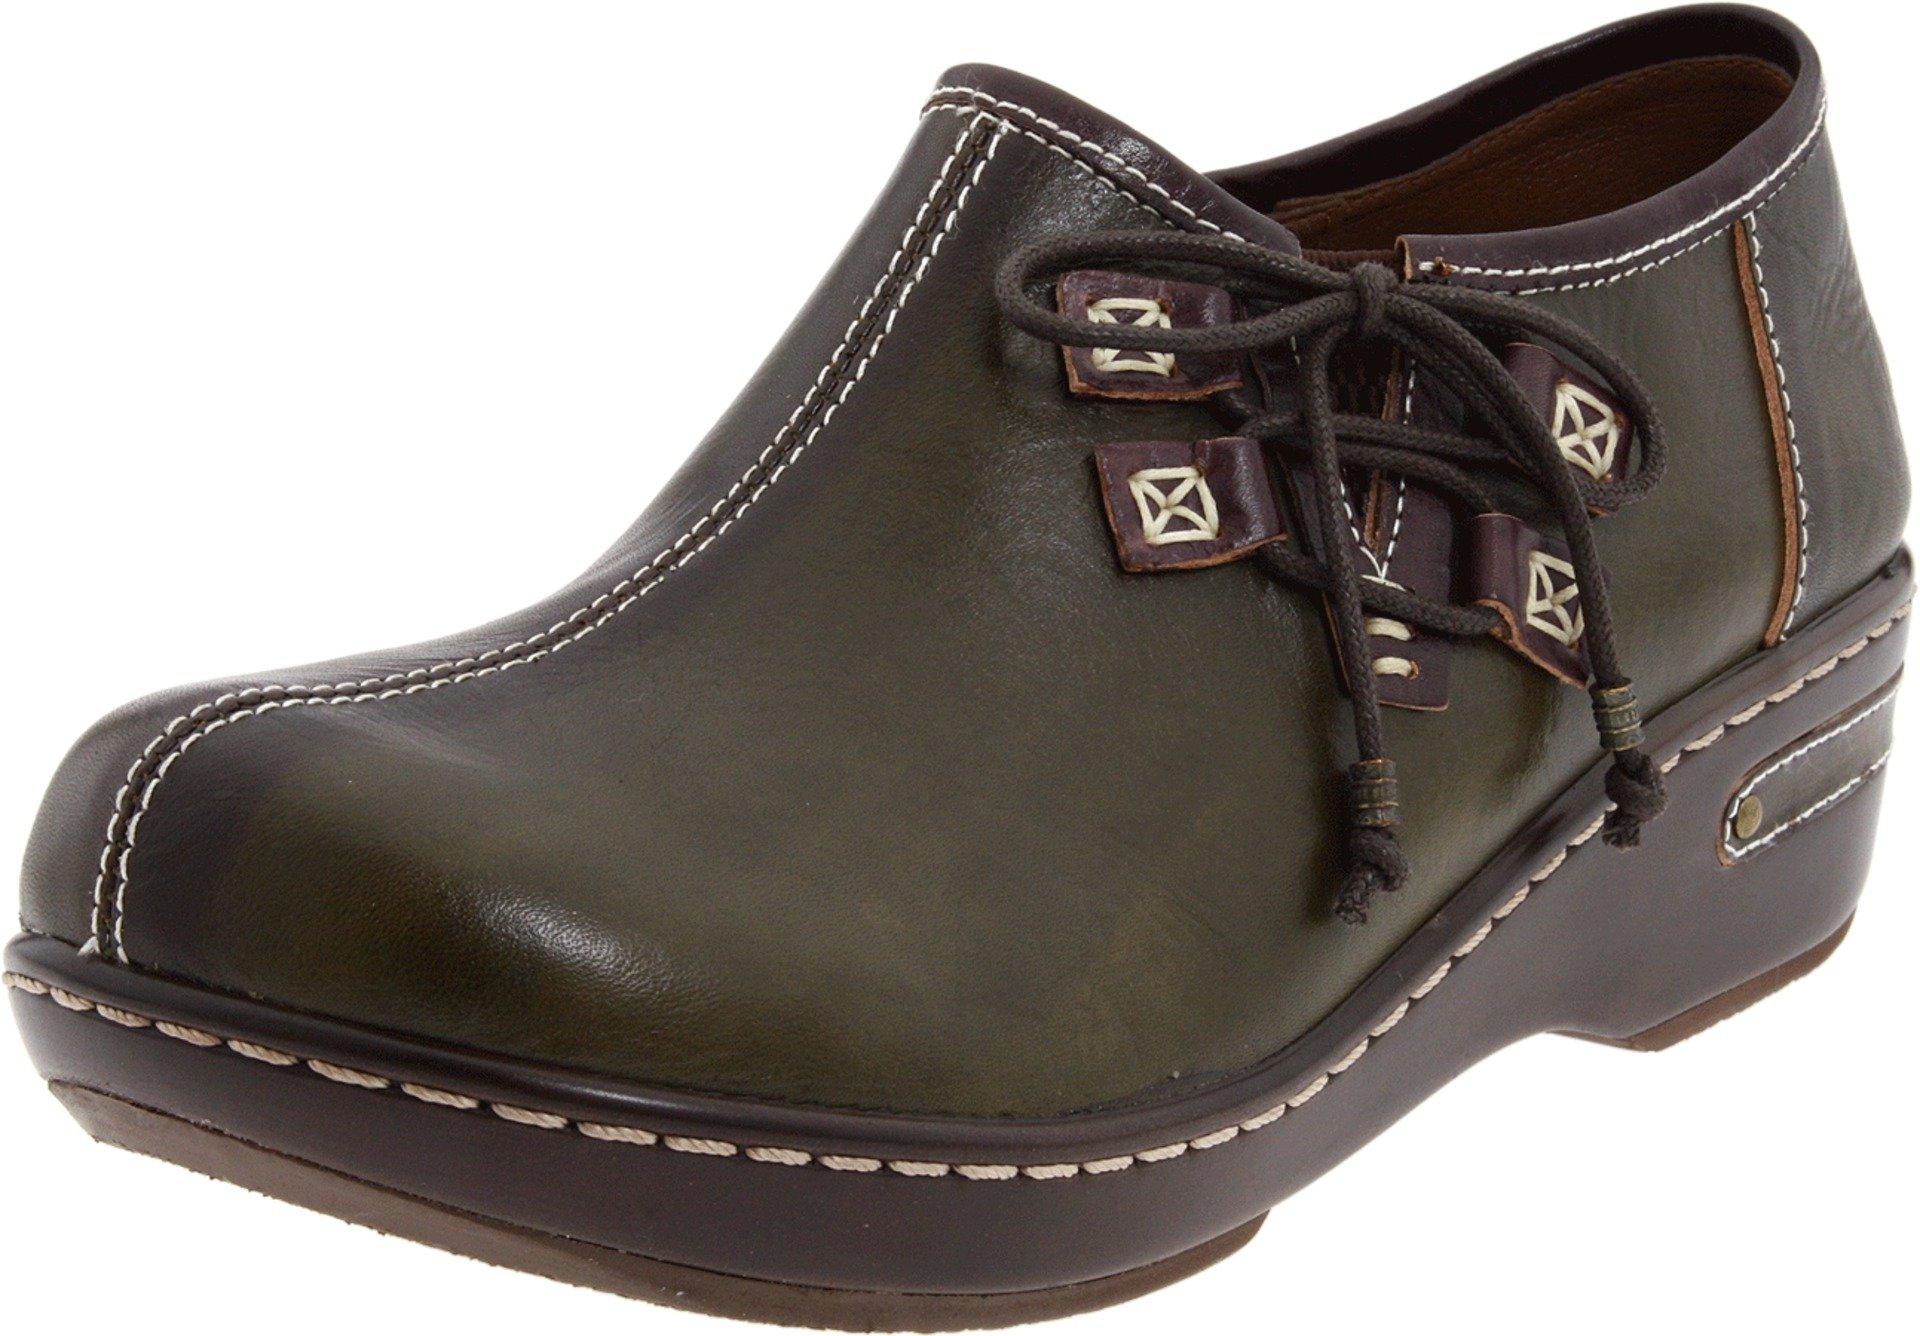 Spring Step Women's Laramie Slip-on,Olive,35 EU/4.5-5 M US